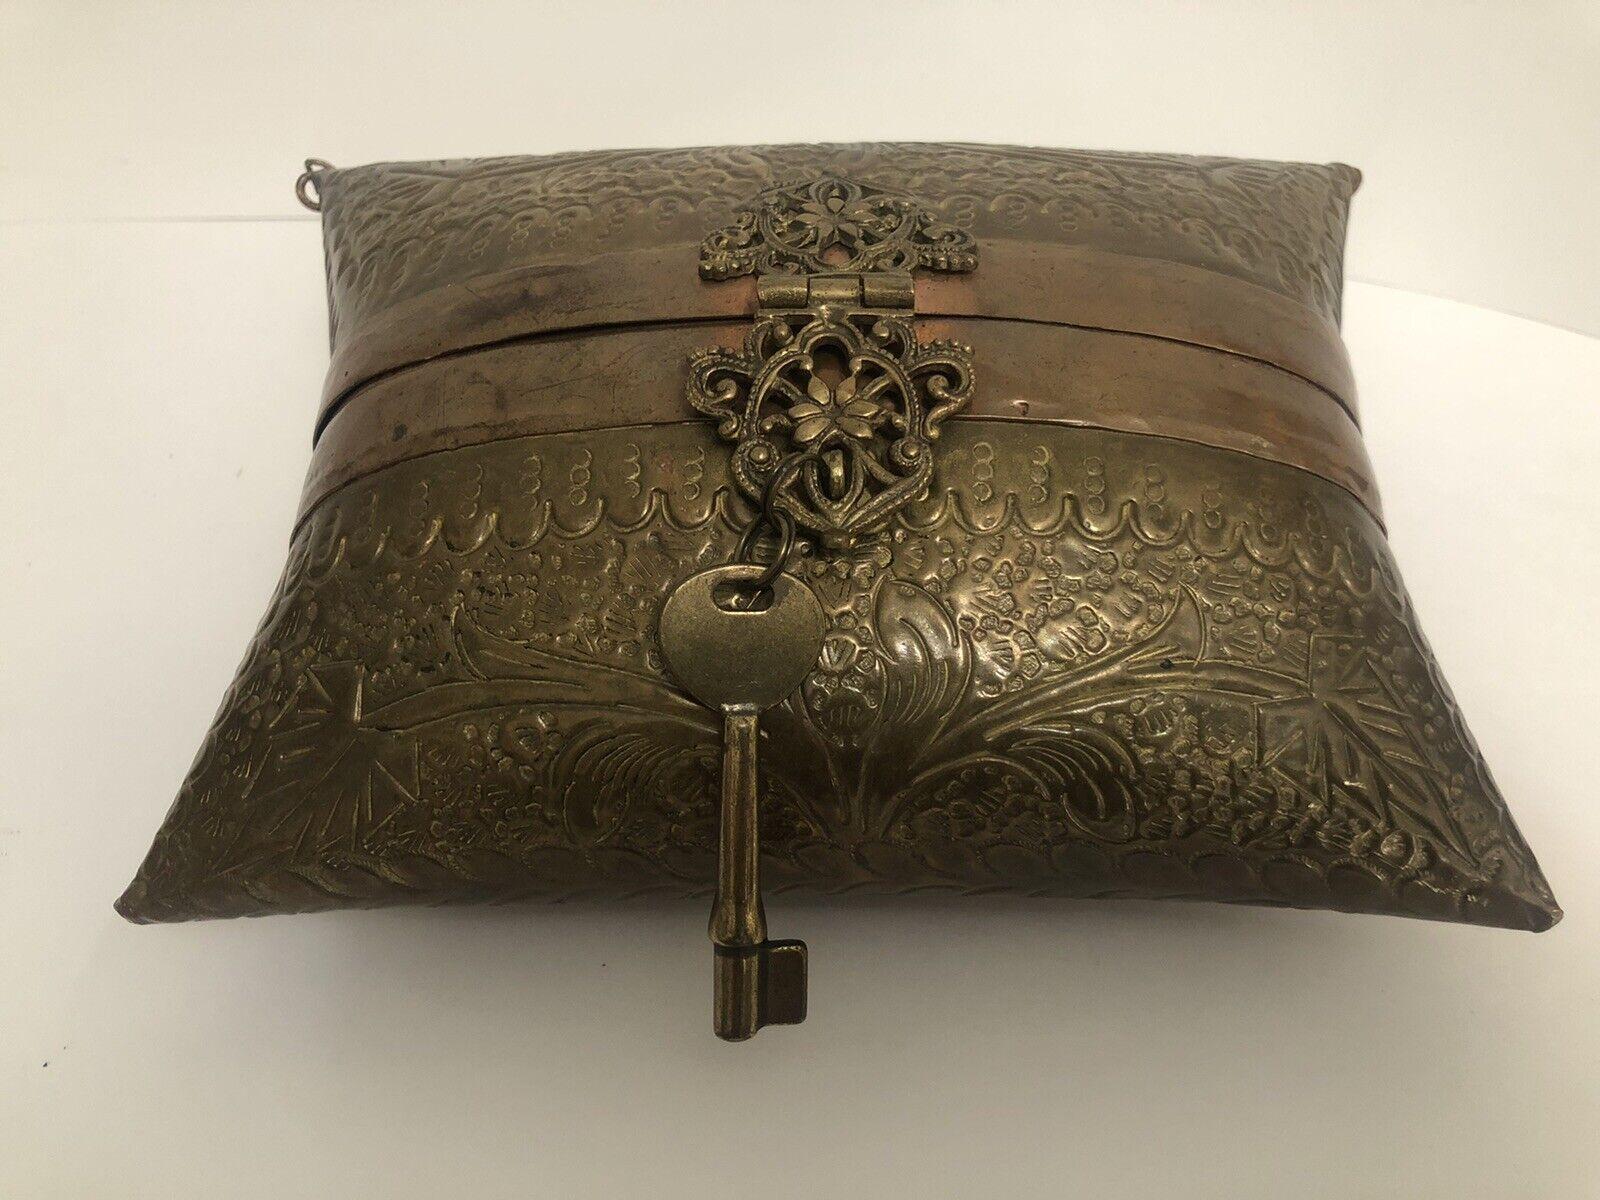 Vtg Pillow Purse Brass 1930s Deep Blue Velvet Lining Fossil Charm Key No Handle